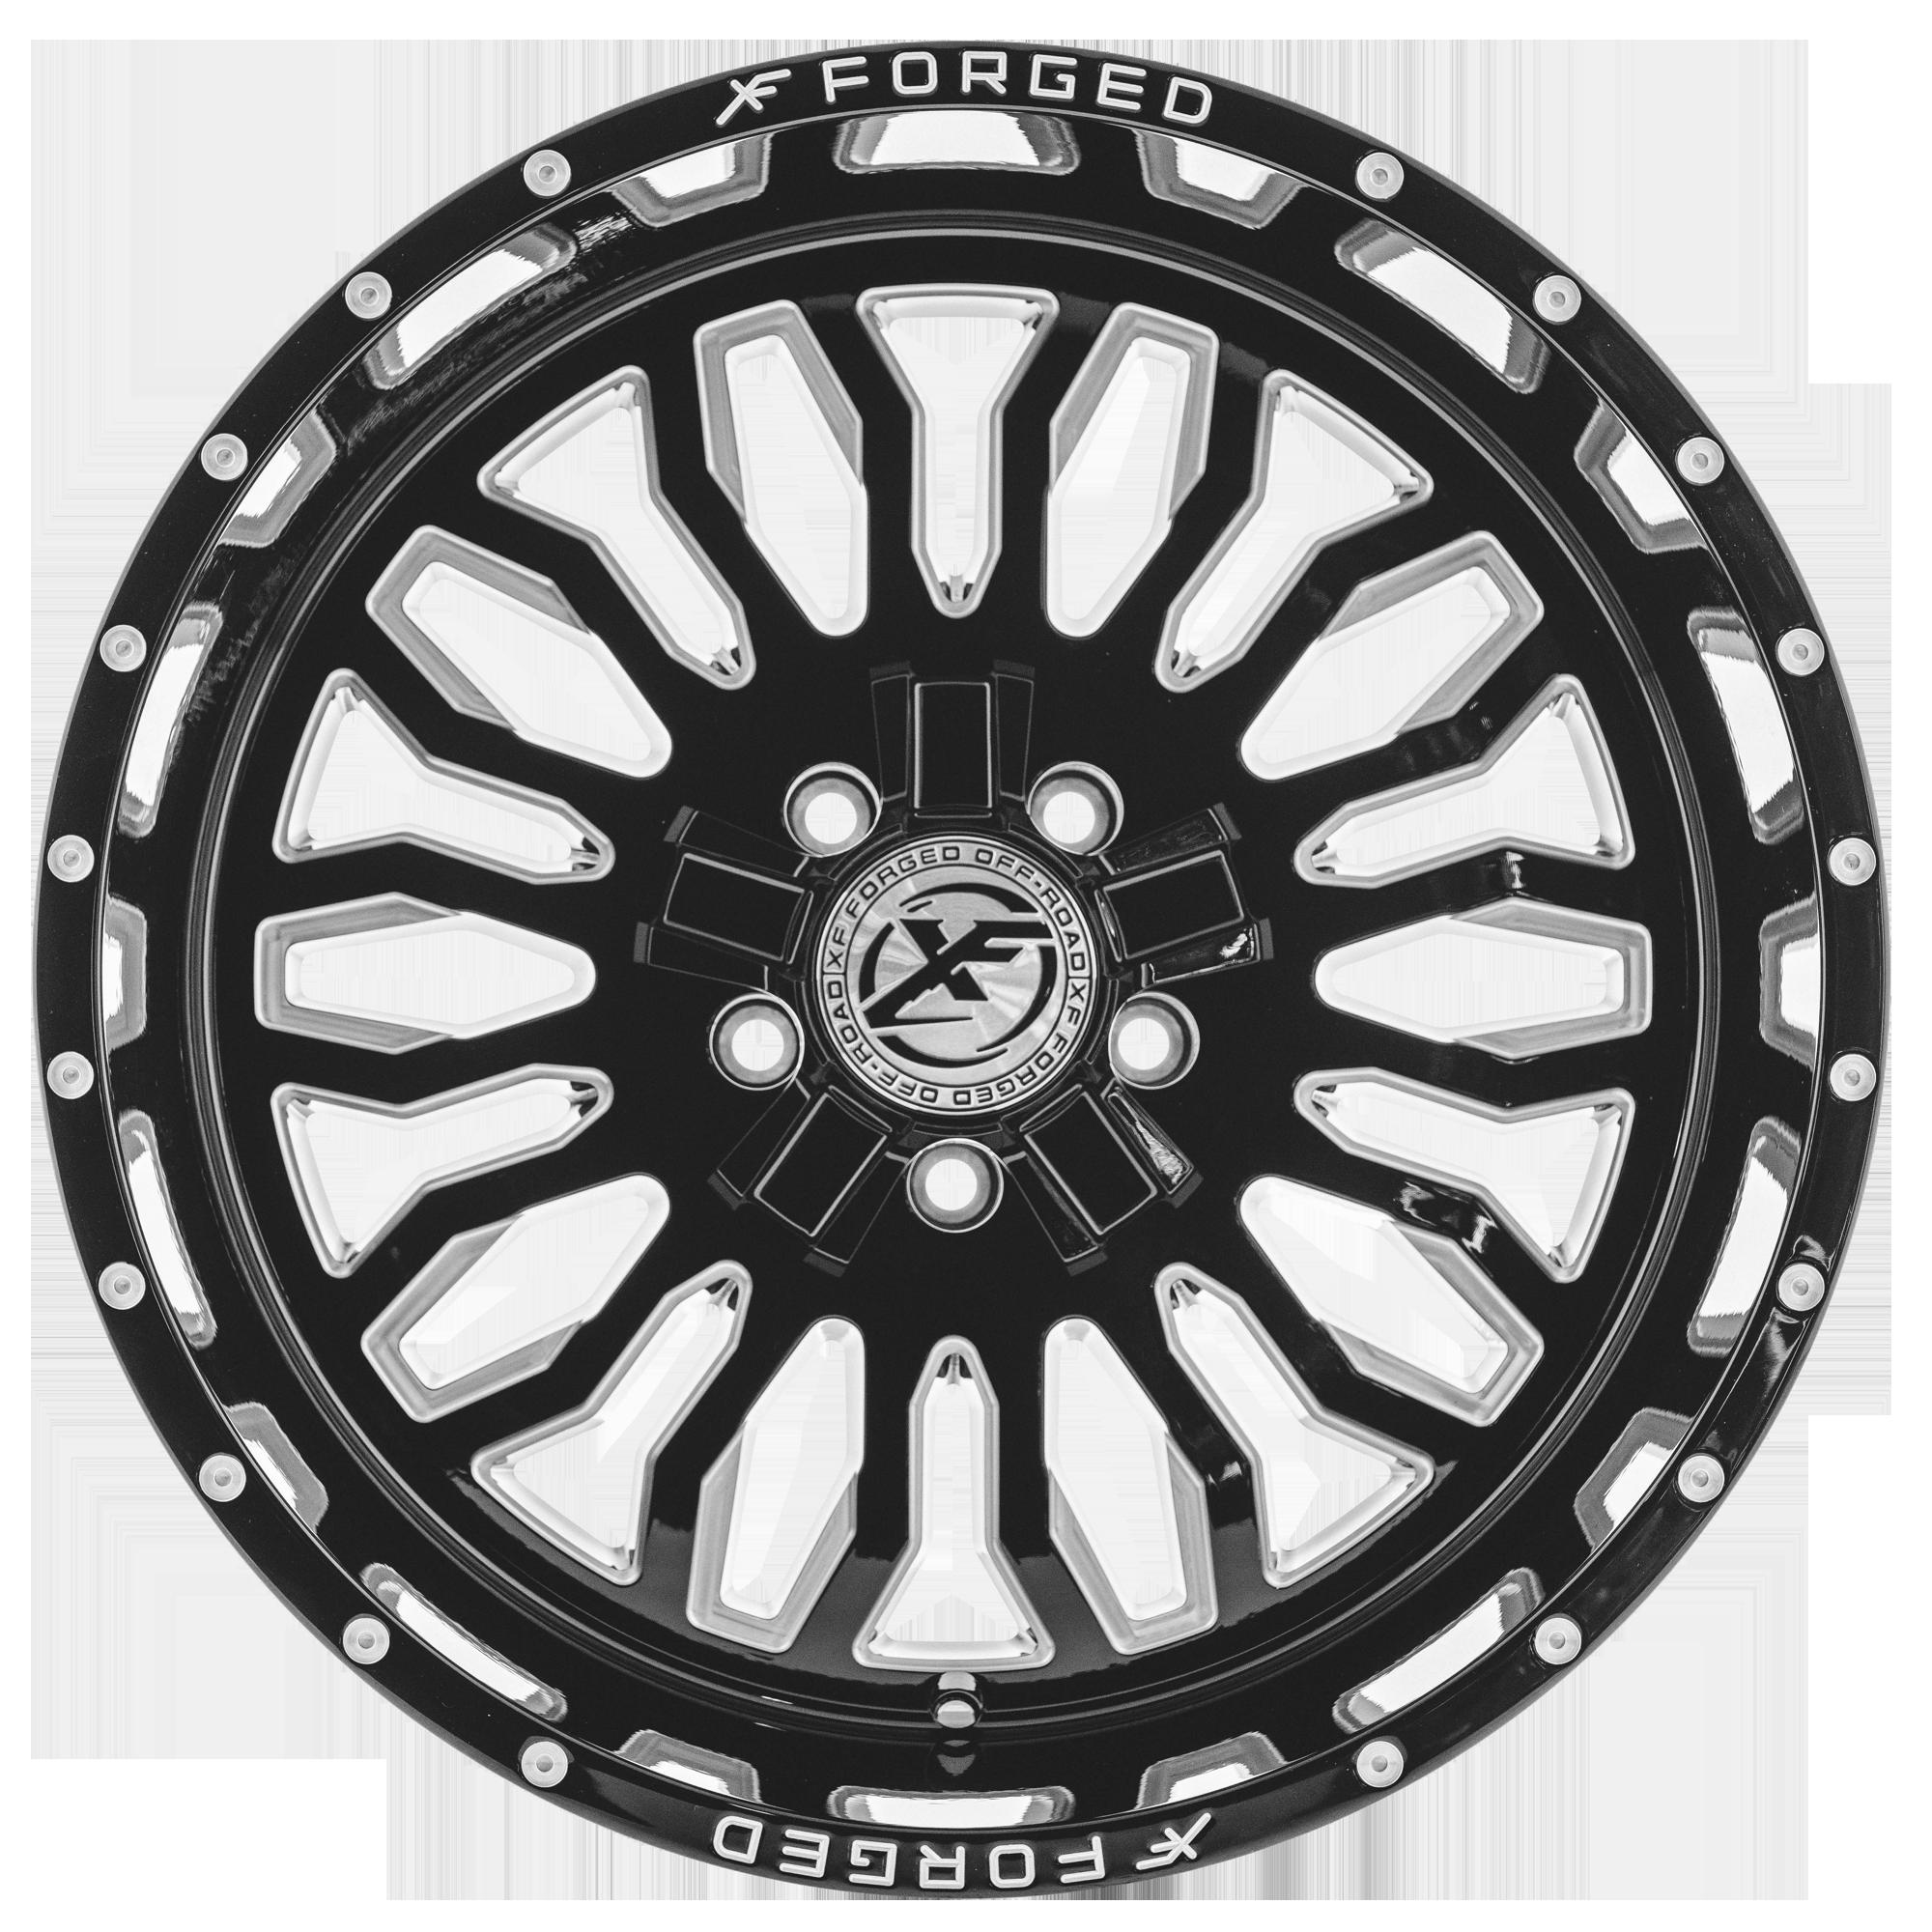 Xf Offroad Xf 223 20x10 5x5 5 5x150 12mm Black Milled Wheel Rim 20 Inch